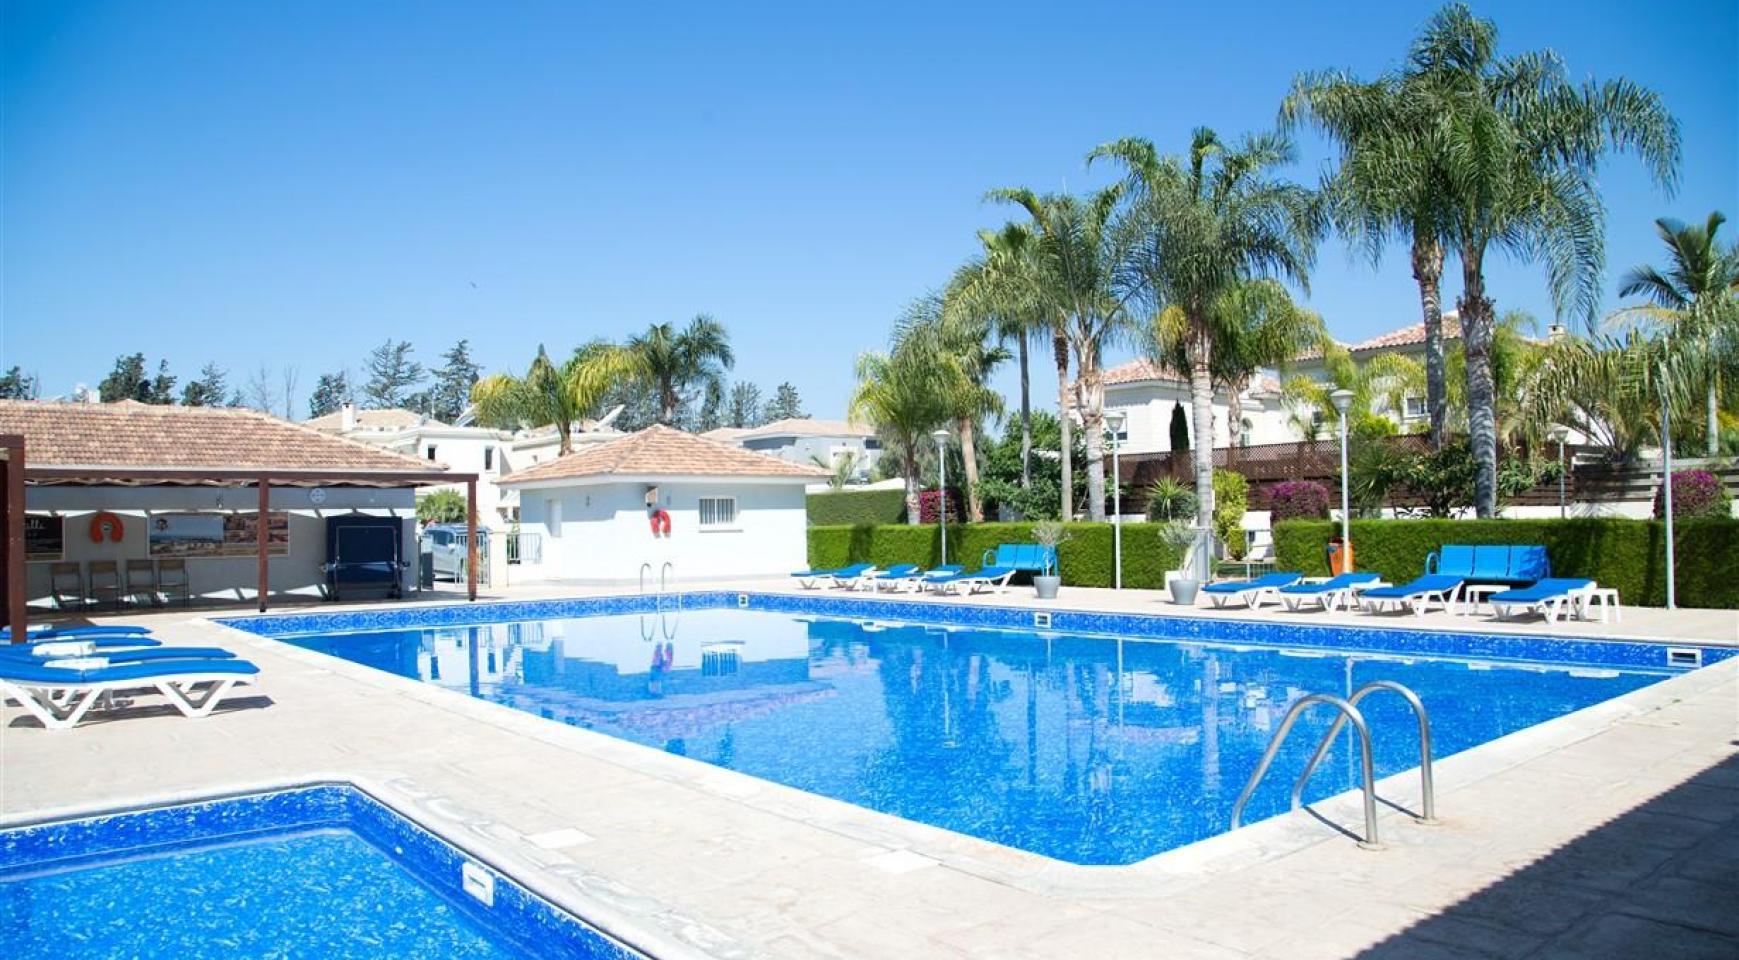 Luxury 2 Bedroom Apartment Mesogios Iris 304 in the Tourist area near the Beach - 32